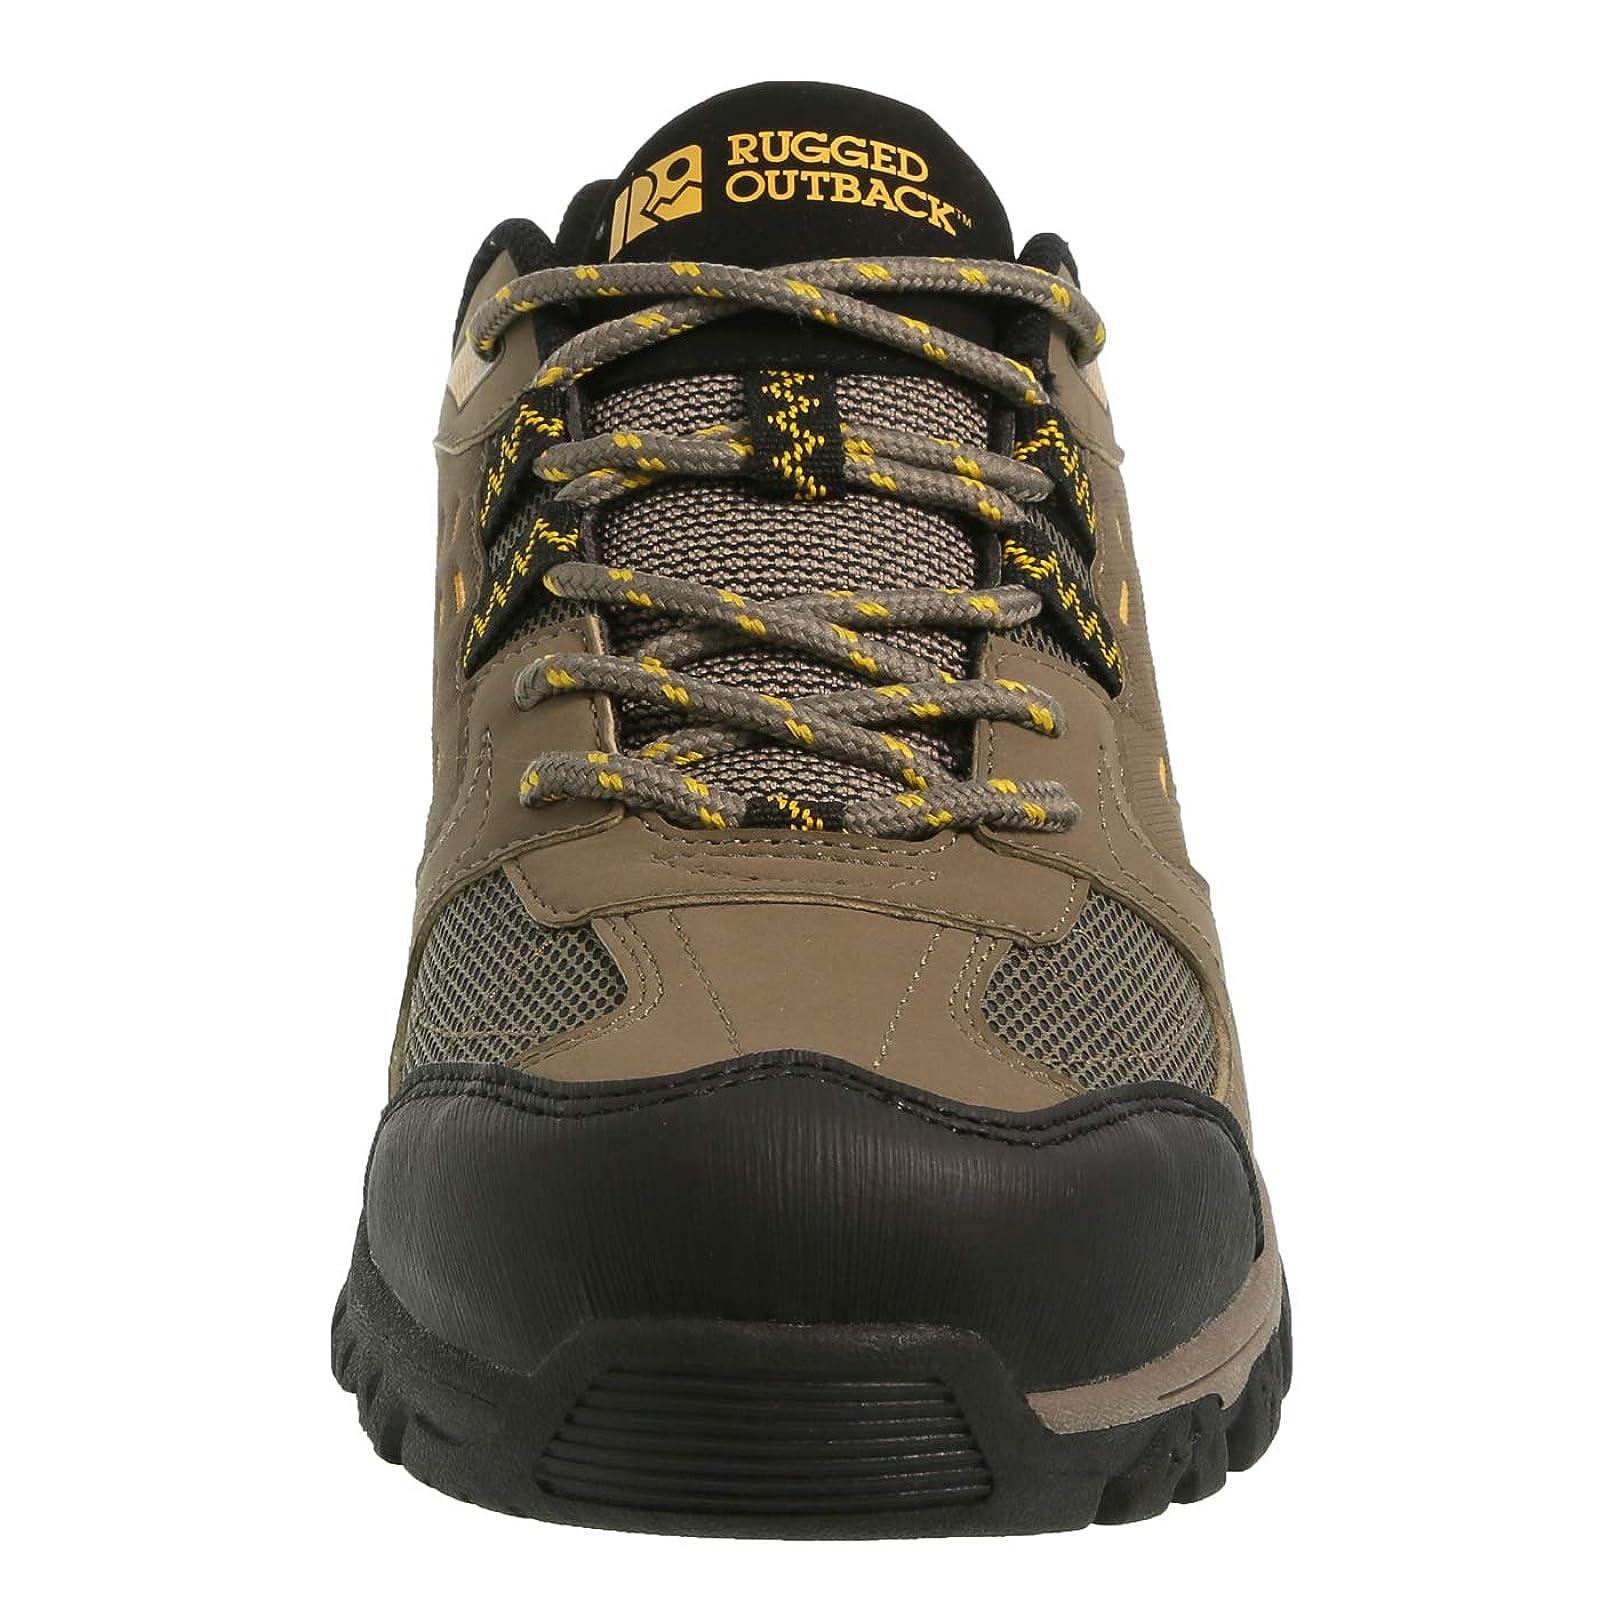 Rugged Outback Men's Dakota Hiker 9.5 B(M) US - 3